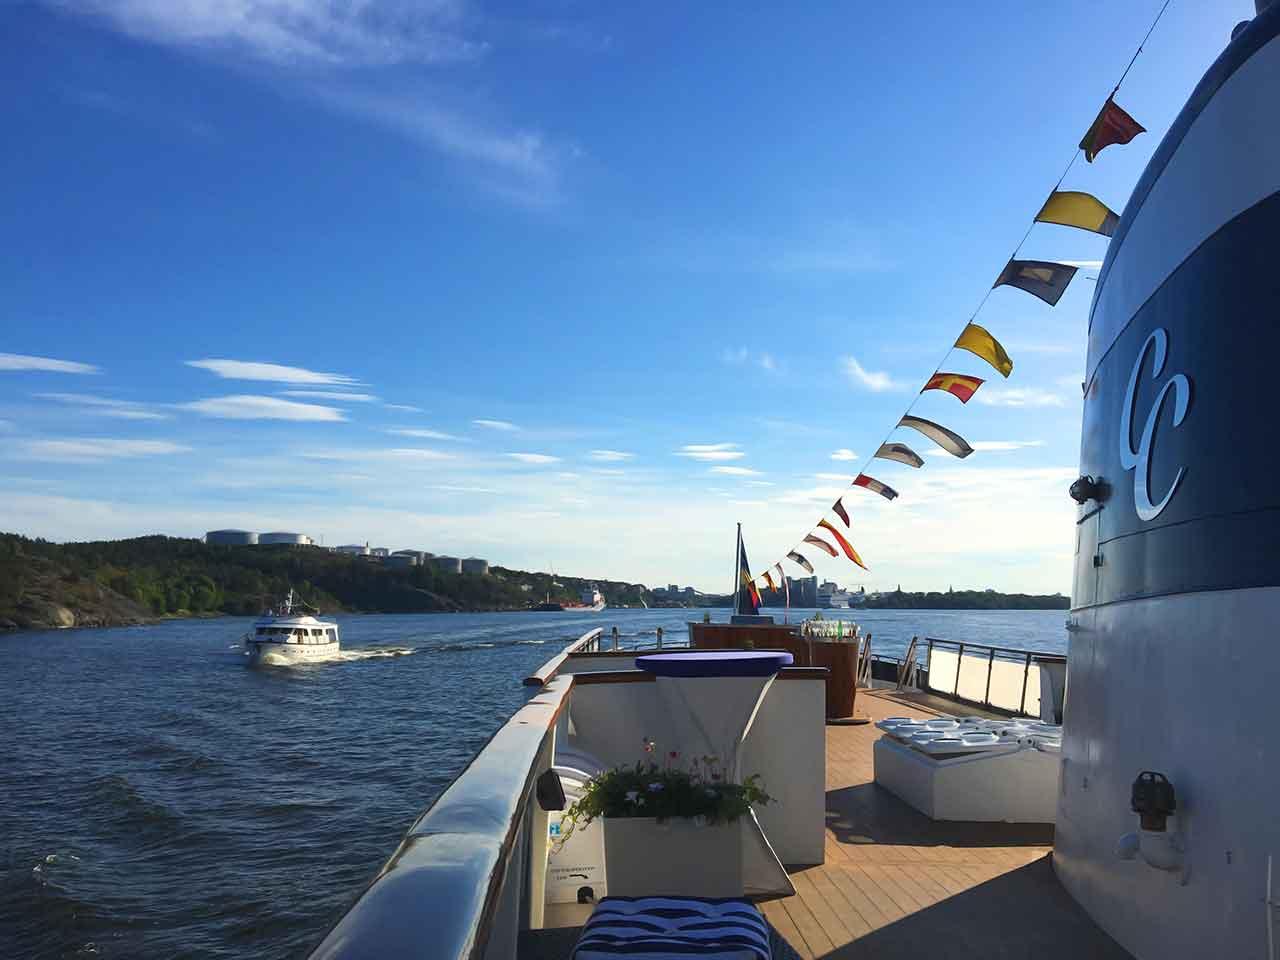 Blue Charm - Festvåning / båtcharter